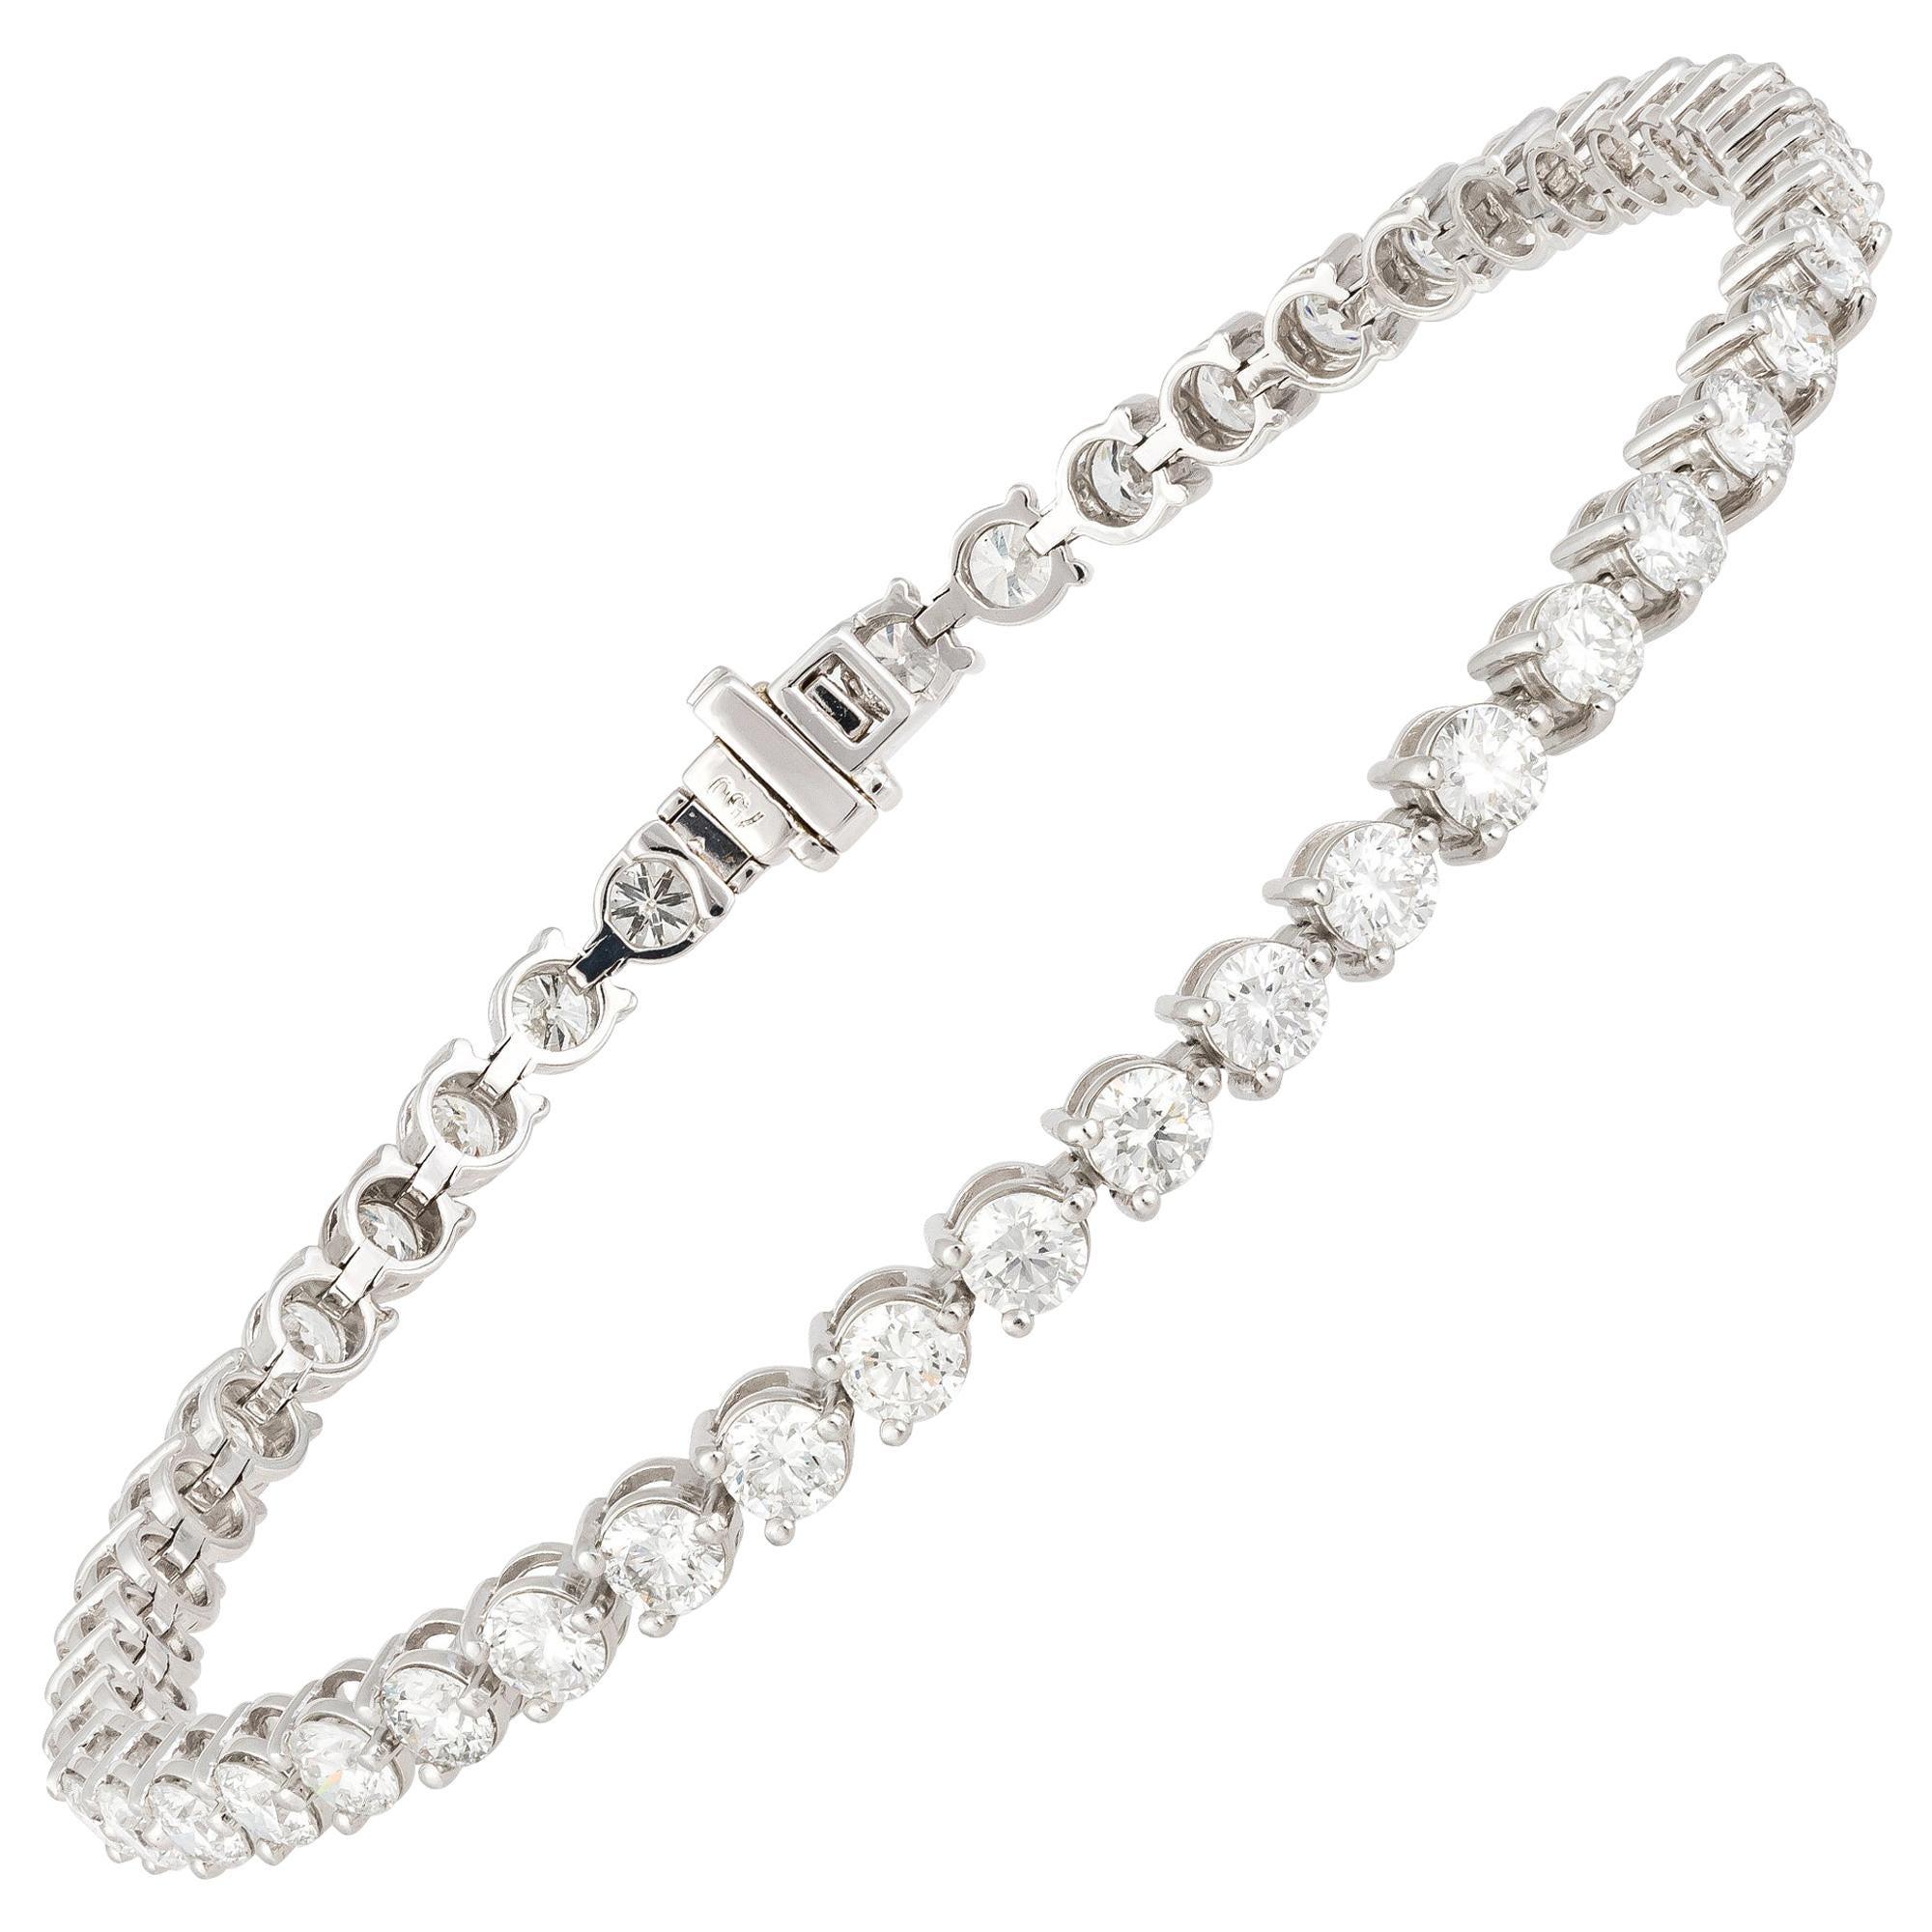 Diamond Tennis Bracelet 18 Karat White Gold Diamond 4.85 Carat/46 Pieces